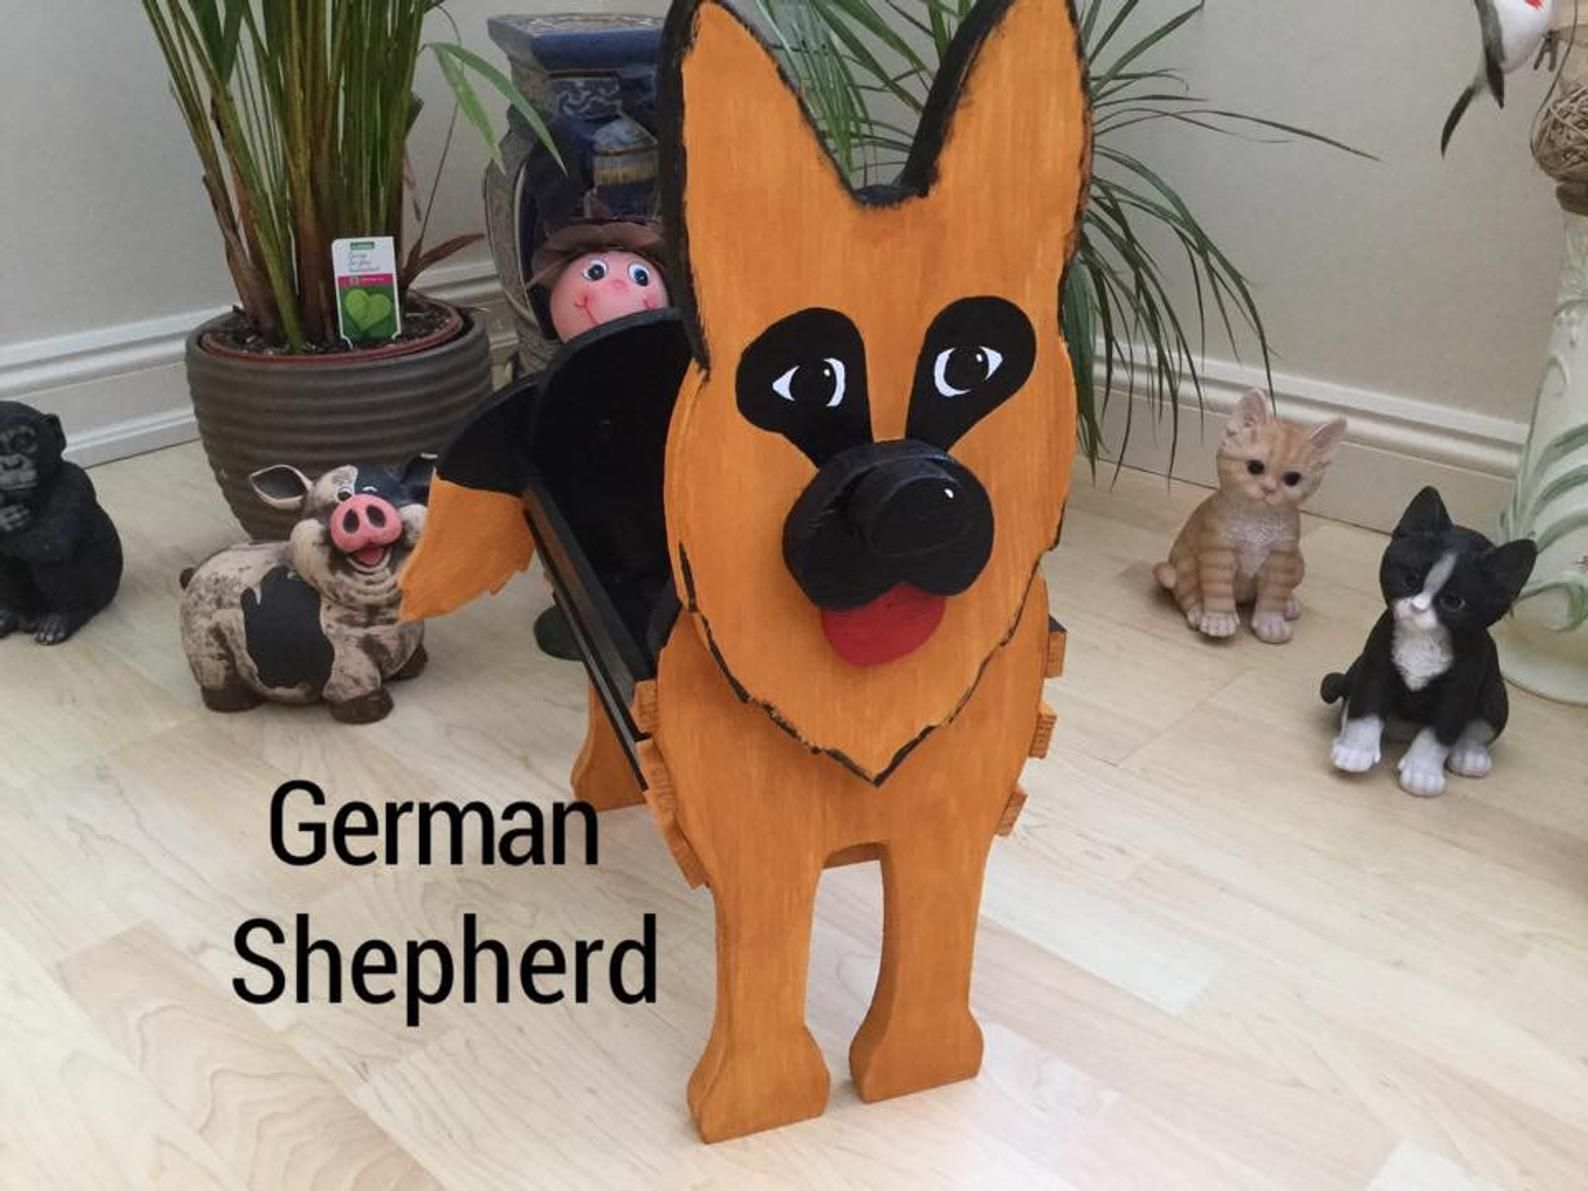 Wooden Pet Planterpet Toy Holder German Shepherd Garden Etsy In 2020 Wooden Garden Ornaments Dog Crafts Cat Plants